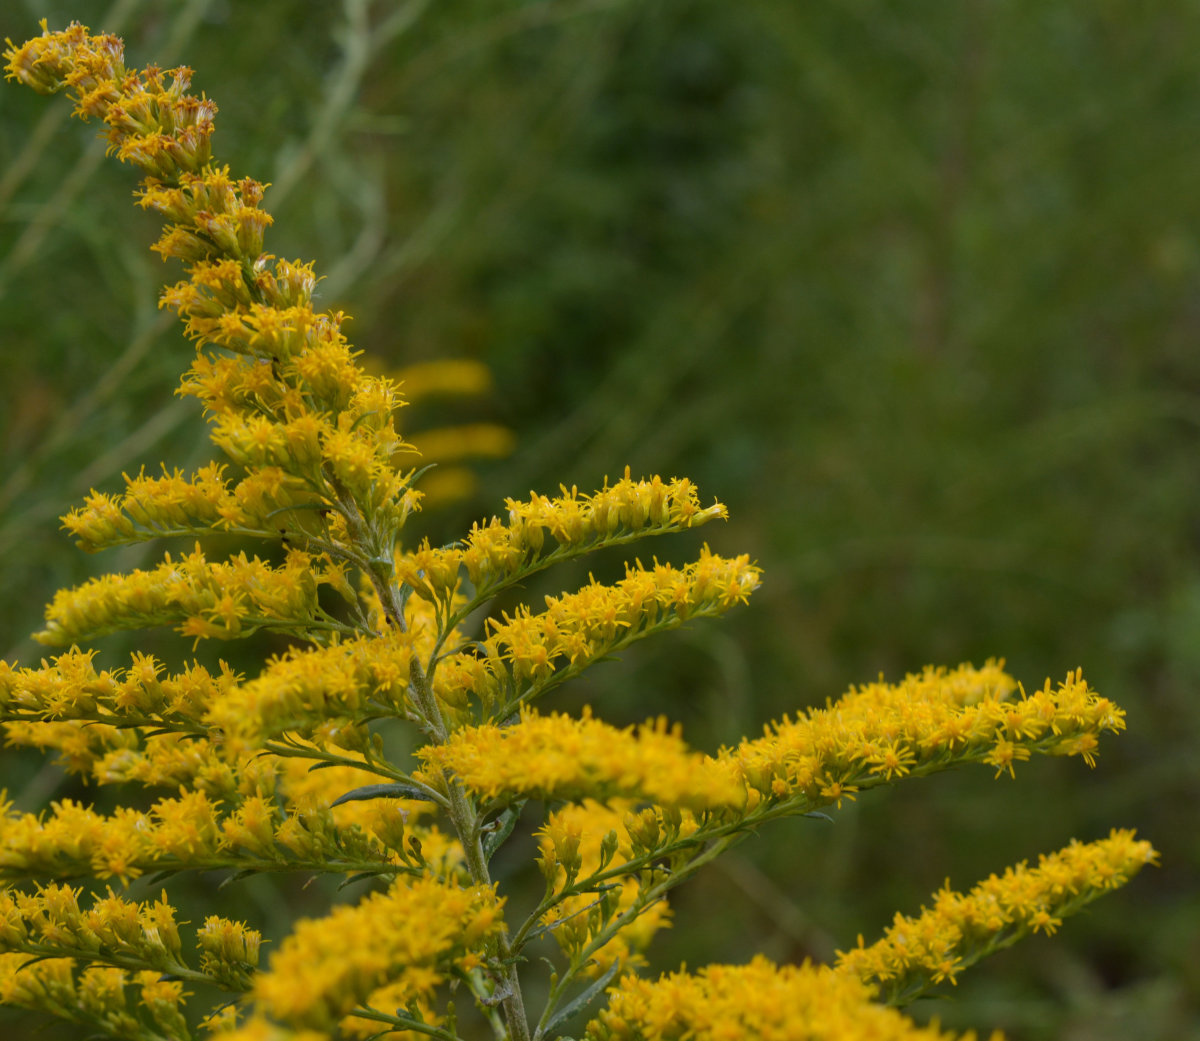 Goldenrod, Weed or Wildflower?